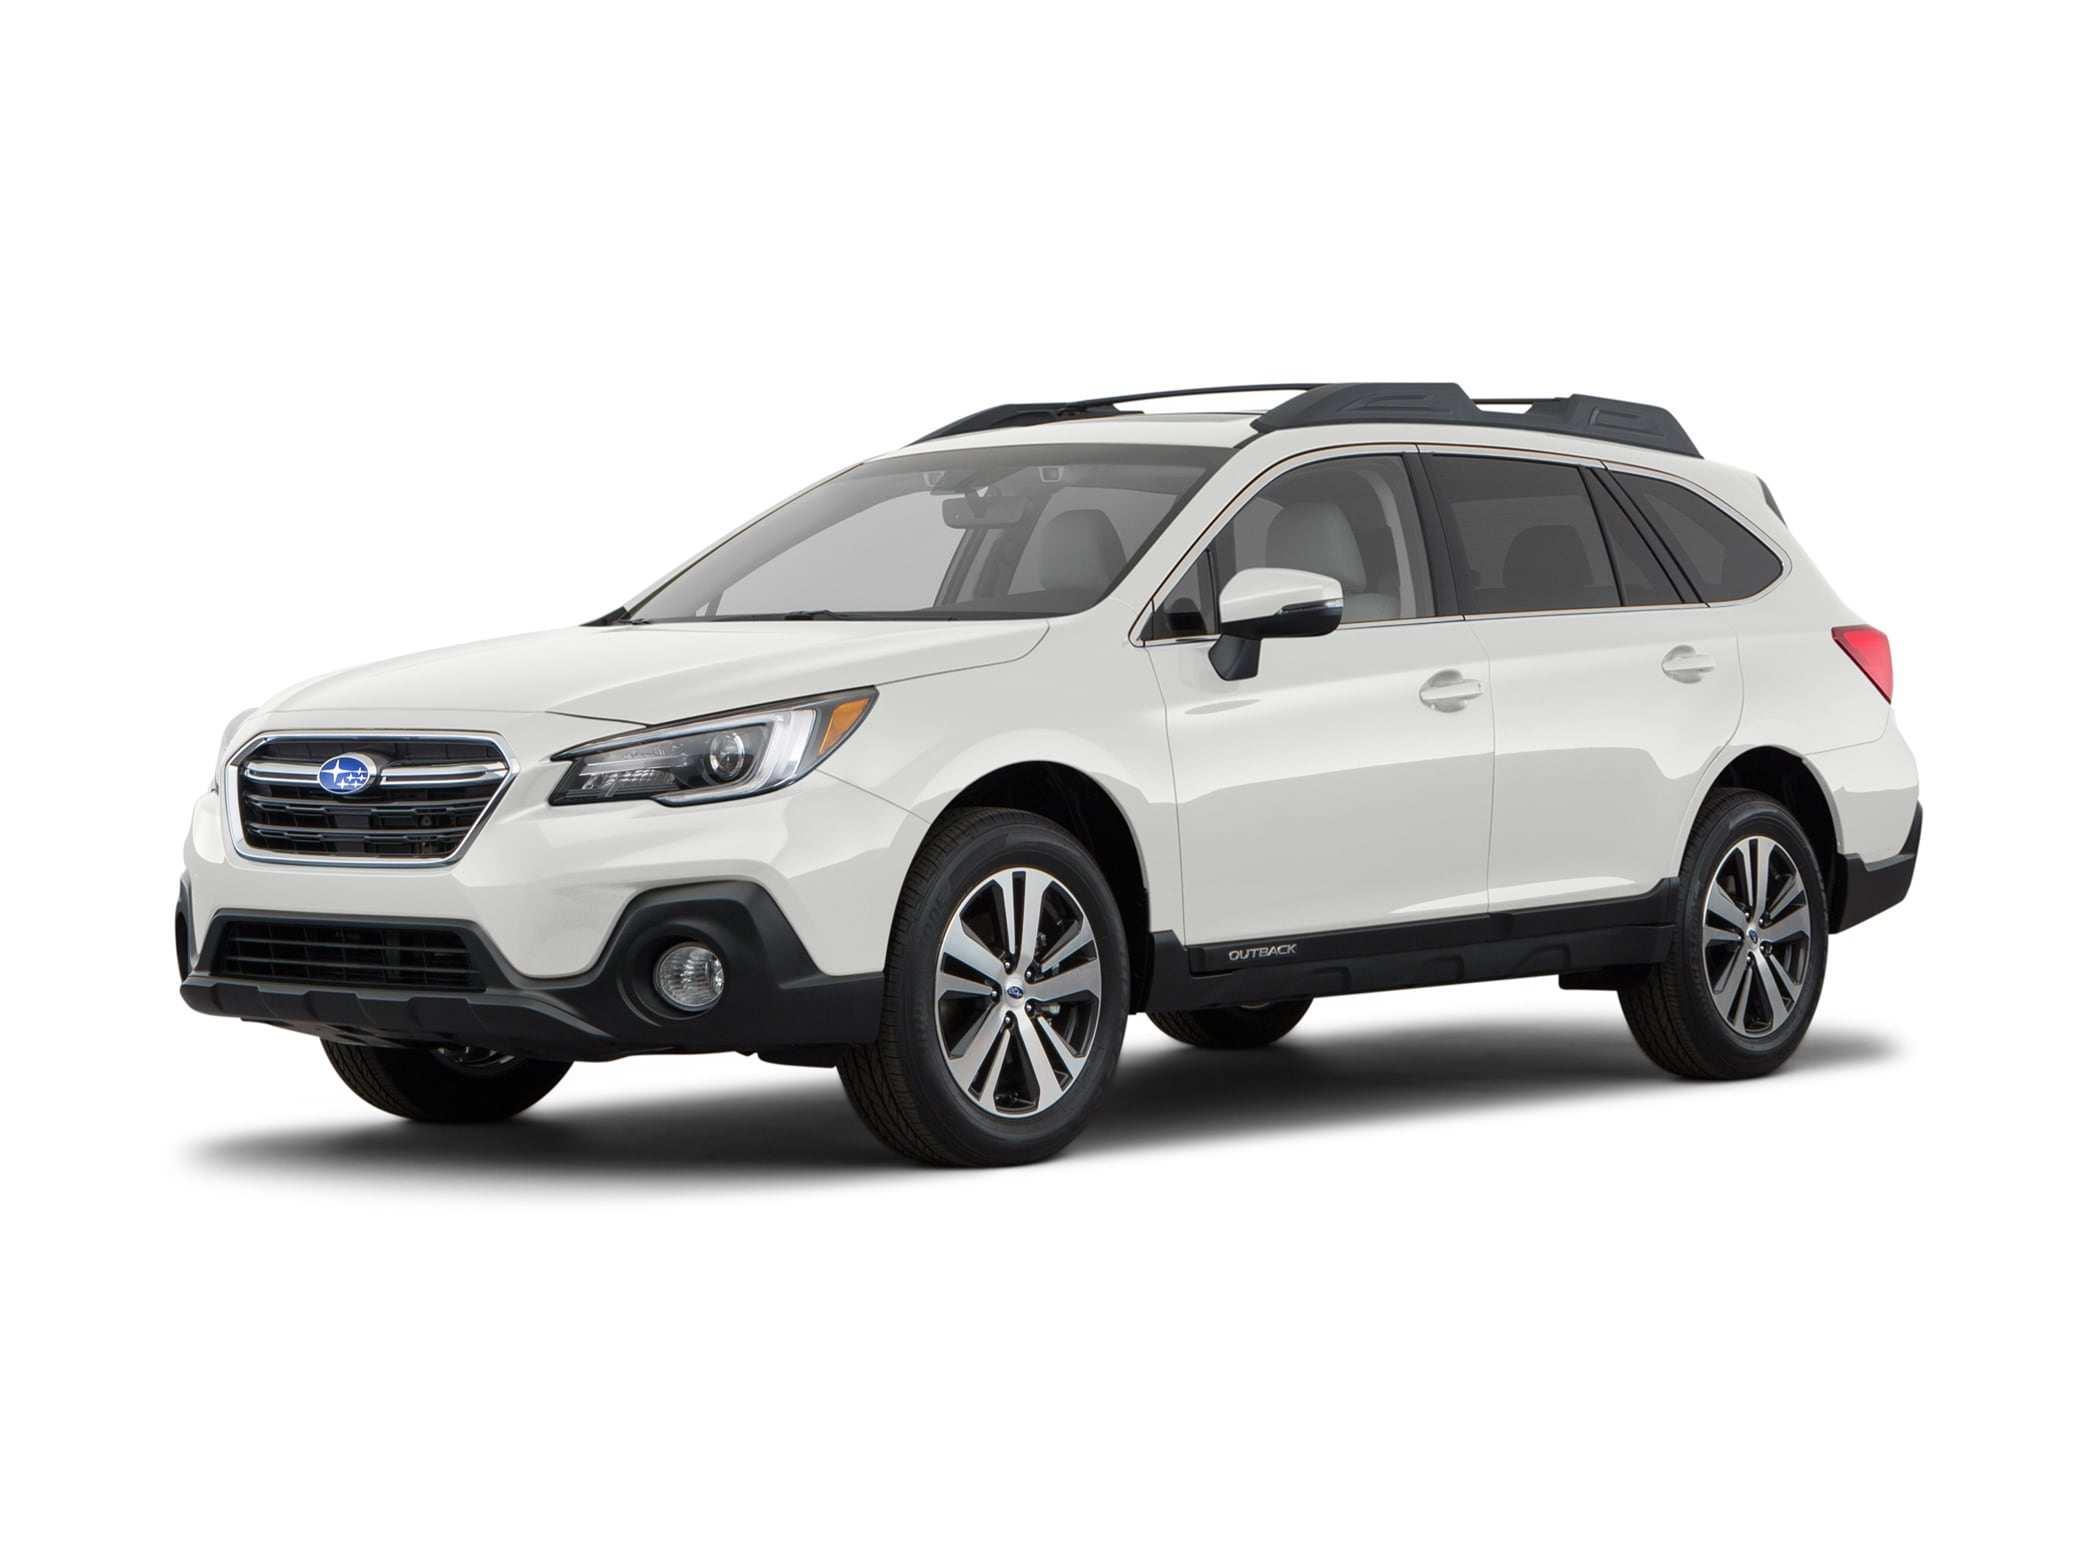 12 New 2019 Subaru Wagon Concept by 2019 Subaru Wagon